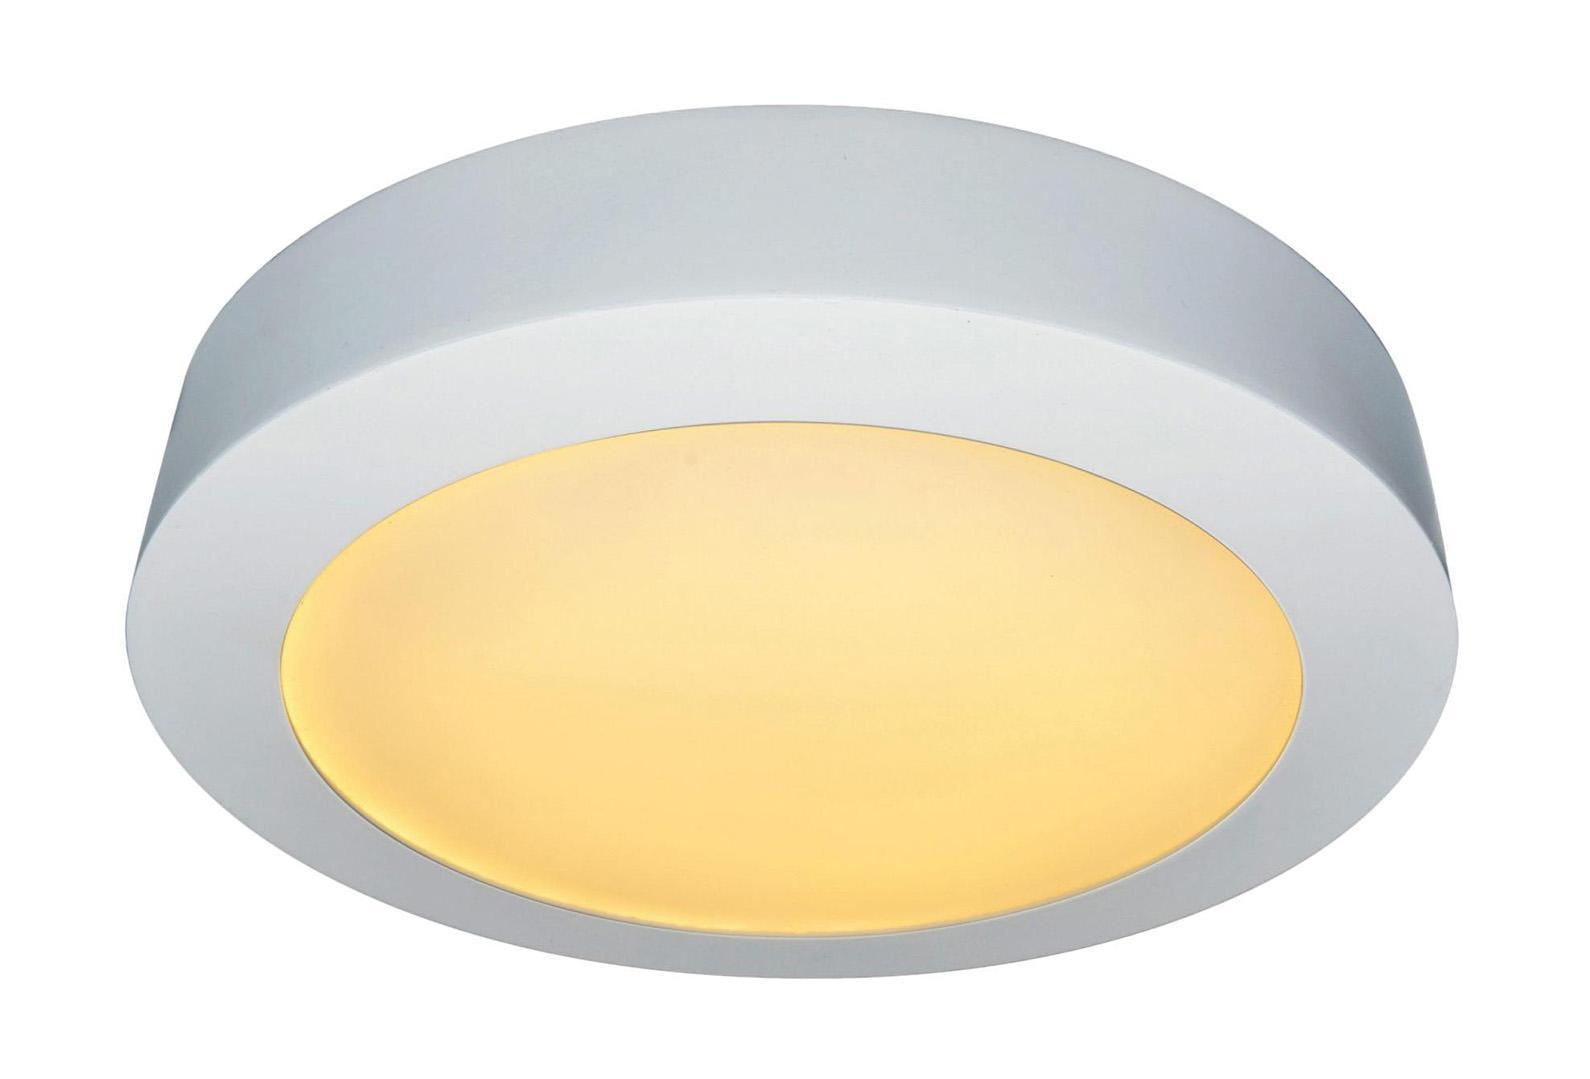 A3018PL-1WH ANGOLO Встраиваемый светильникA3018PL-1WH18W LED; 1440 lm Материал: Арматура: Алюминий / Элемент декора: ПластикРазмер: 220x220x40Цвет: Белый